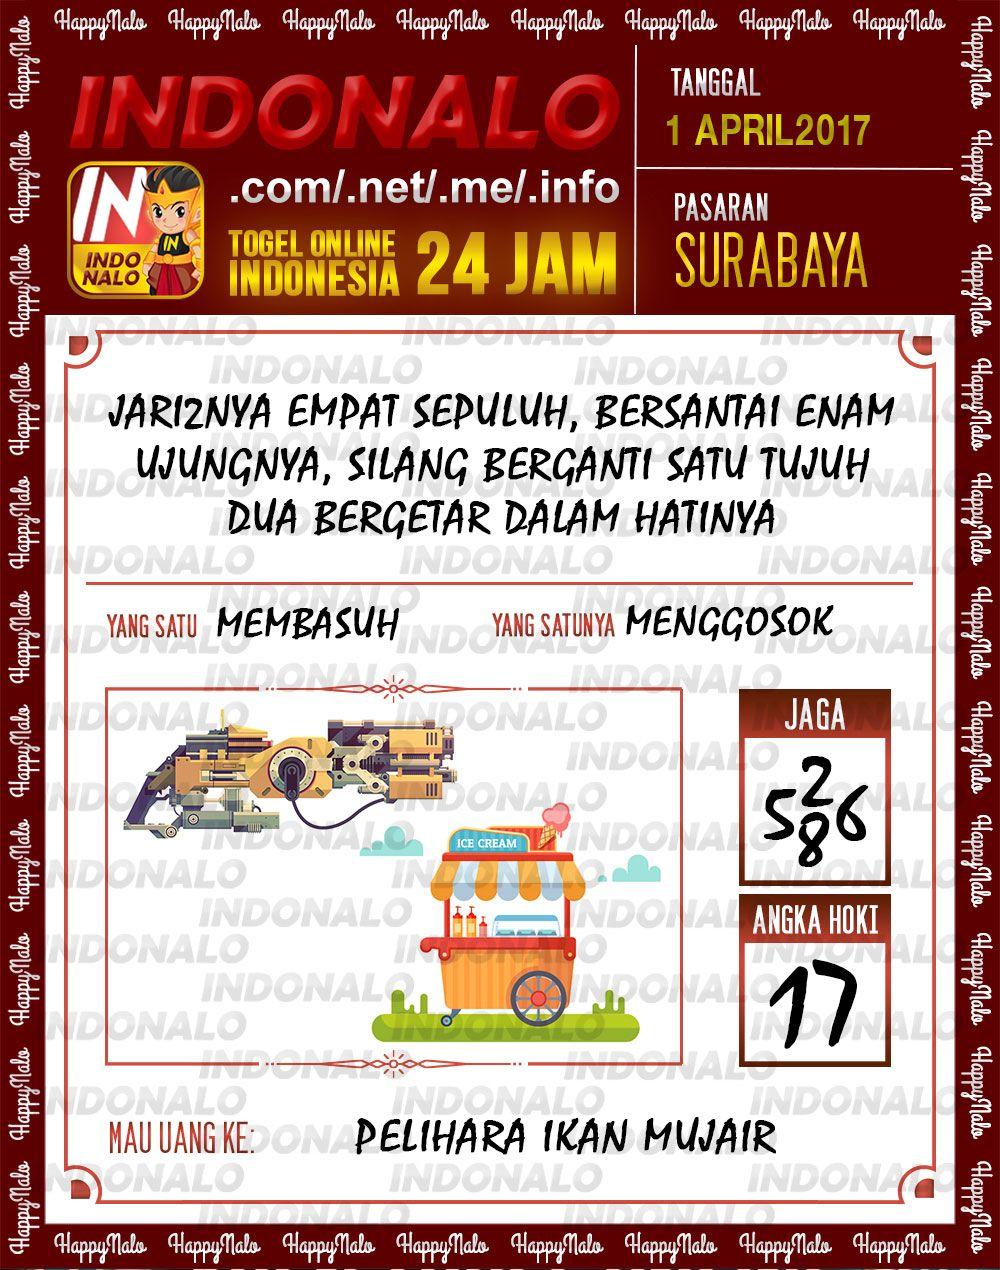 Angka Jp 4d Togel Wap Online Indonalo Surabaya 1 April 2017 Drakula Pelampung Tanggal